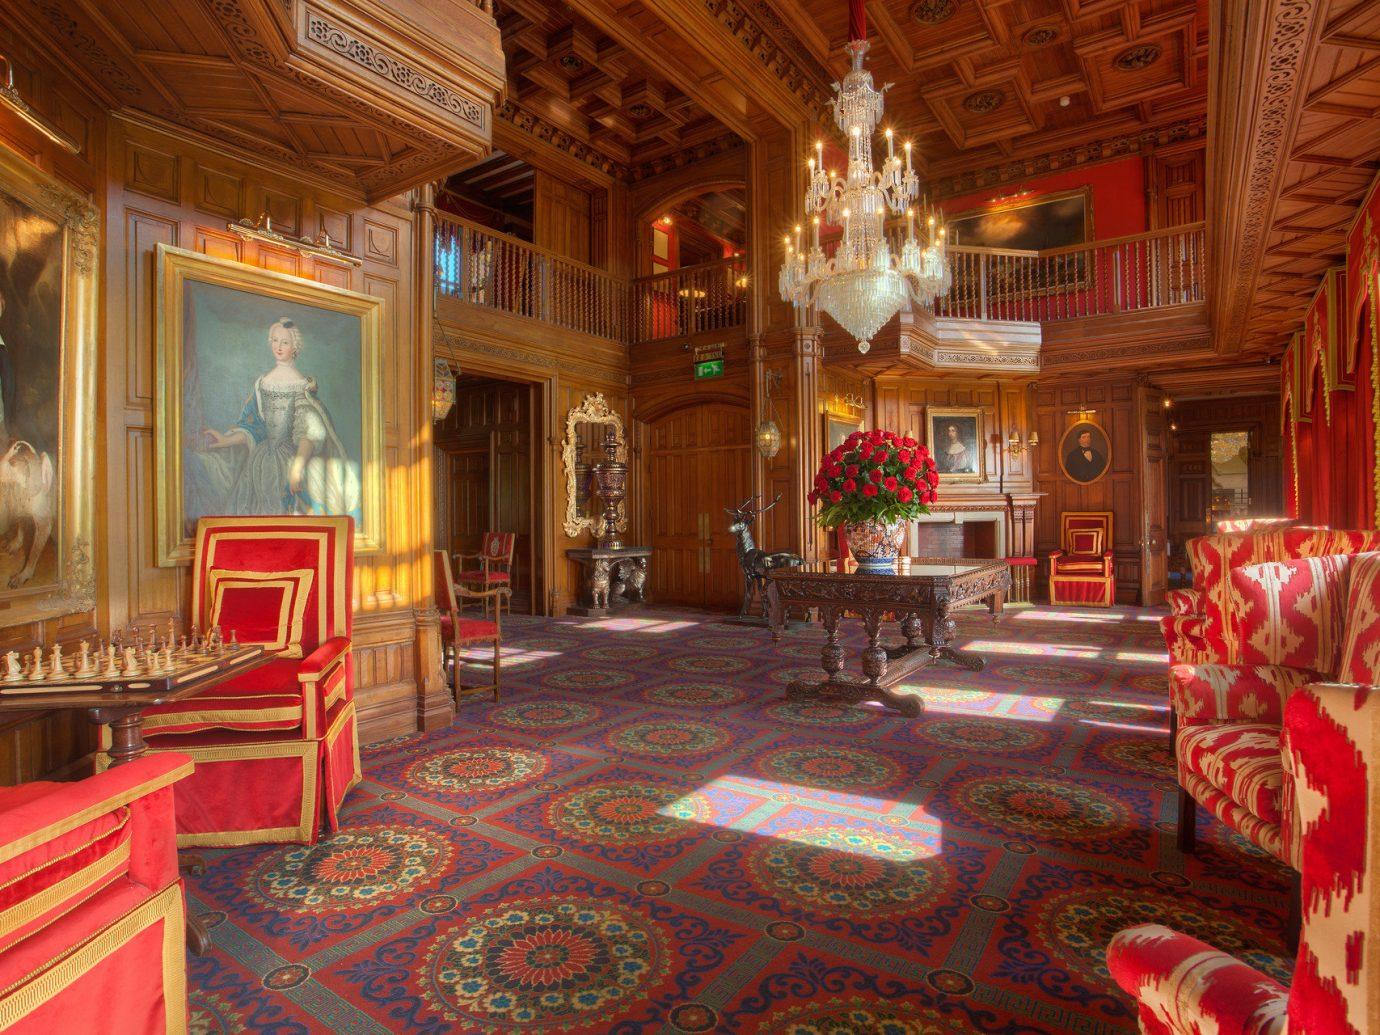 Trip Ideas indoor floor room Lobby Living building estate palace mansion interior design living room Resort furniture